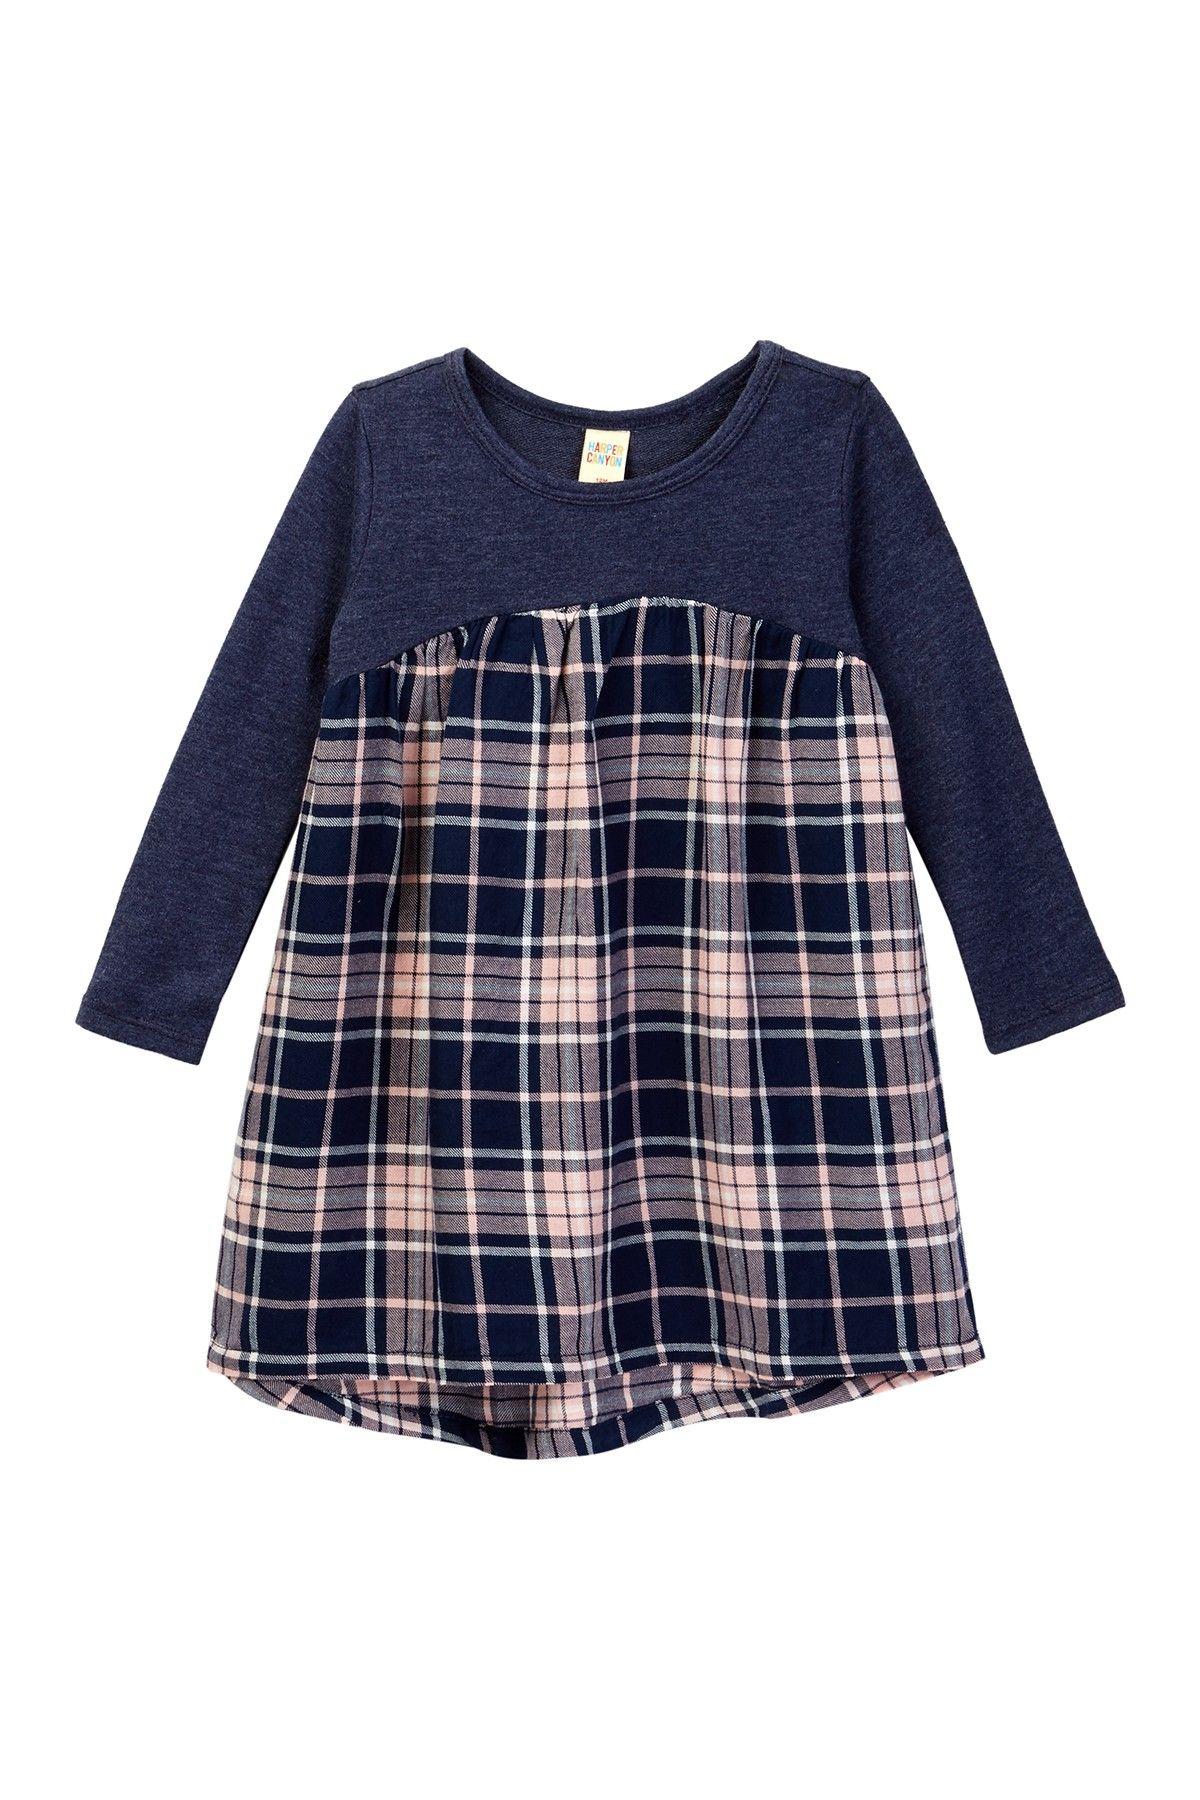 Harper Canyon Mixed Media Fleece Dress Baby Girls